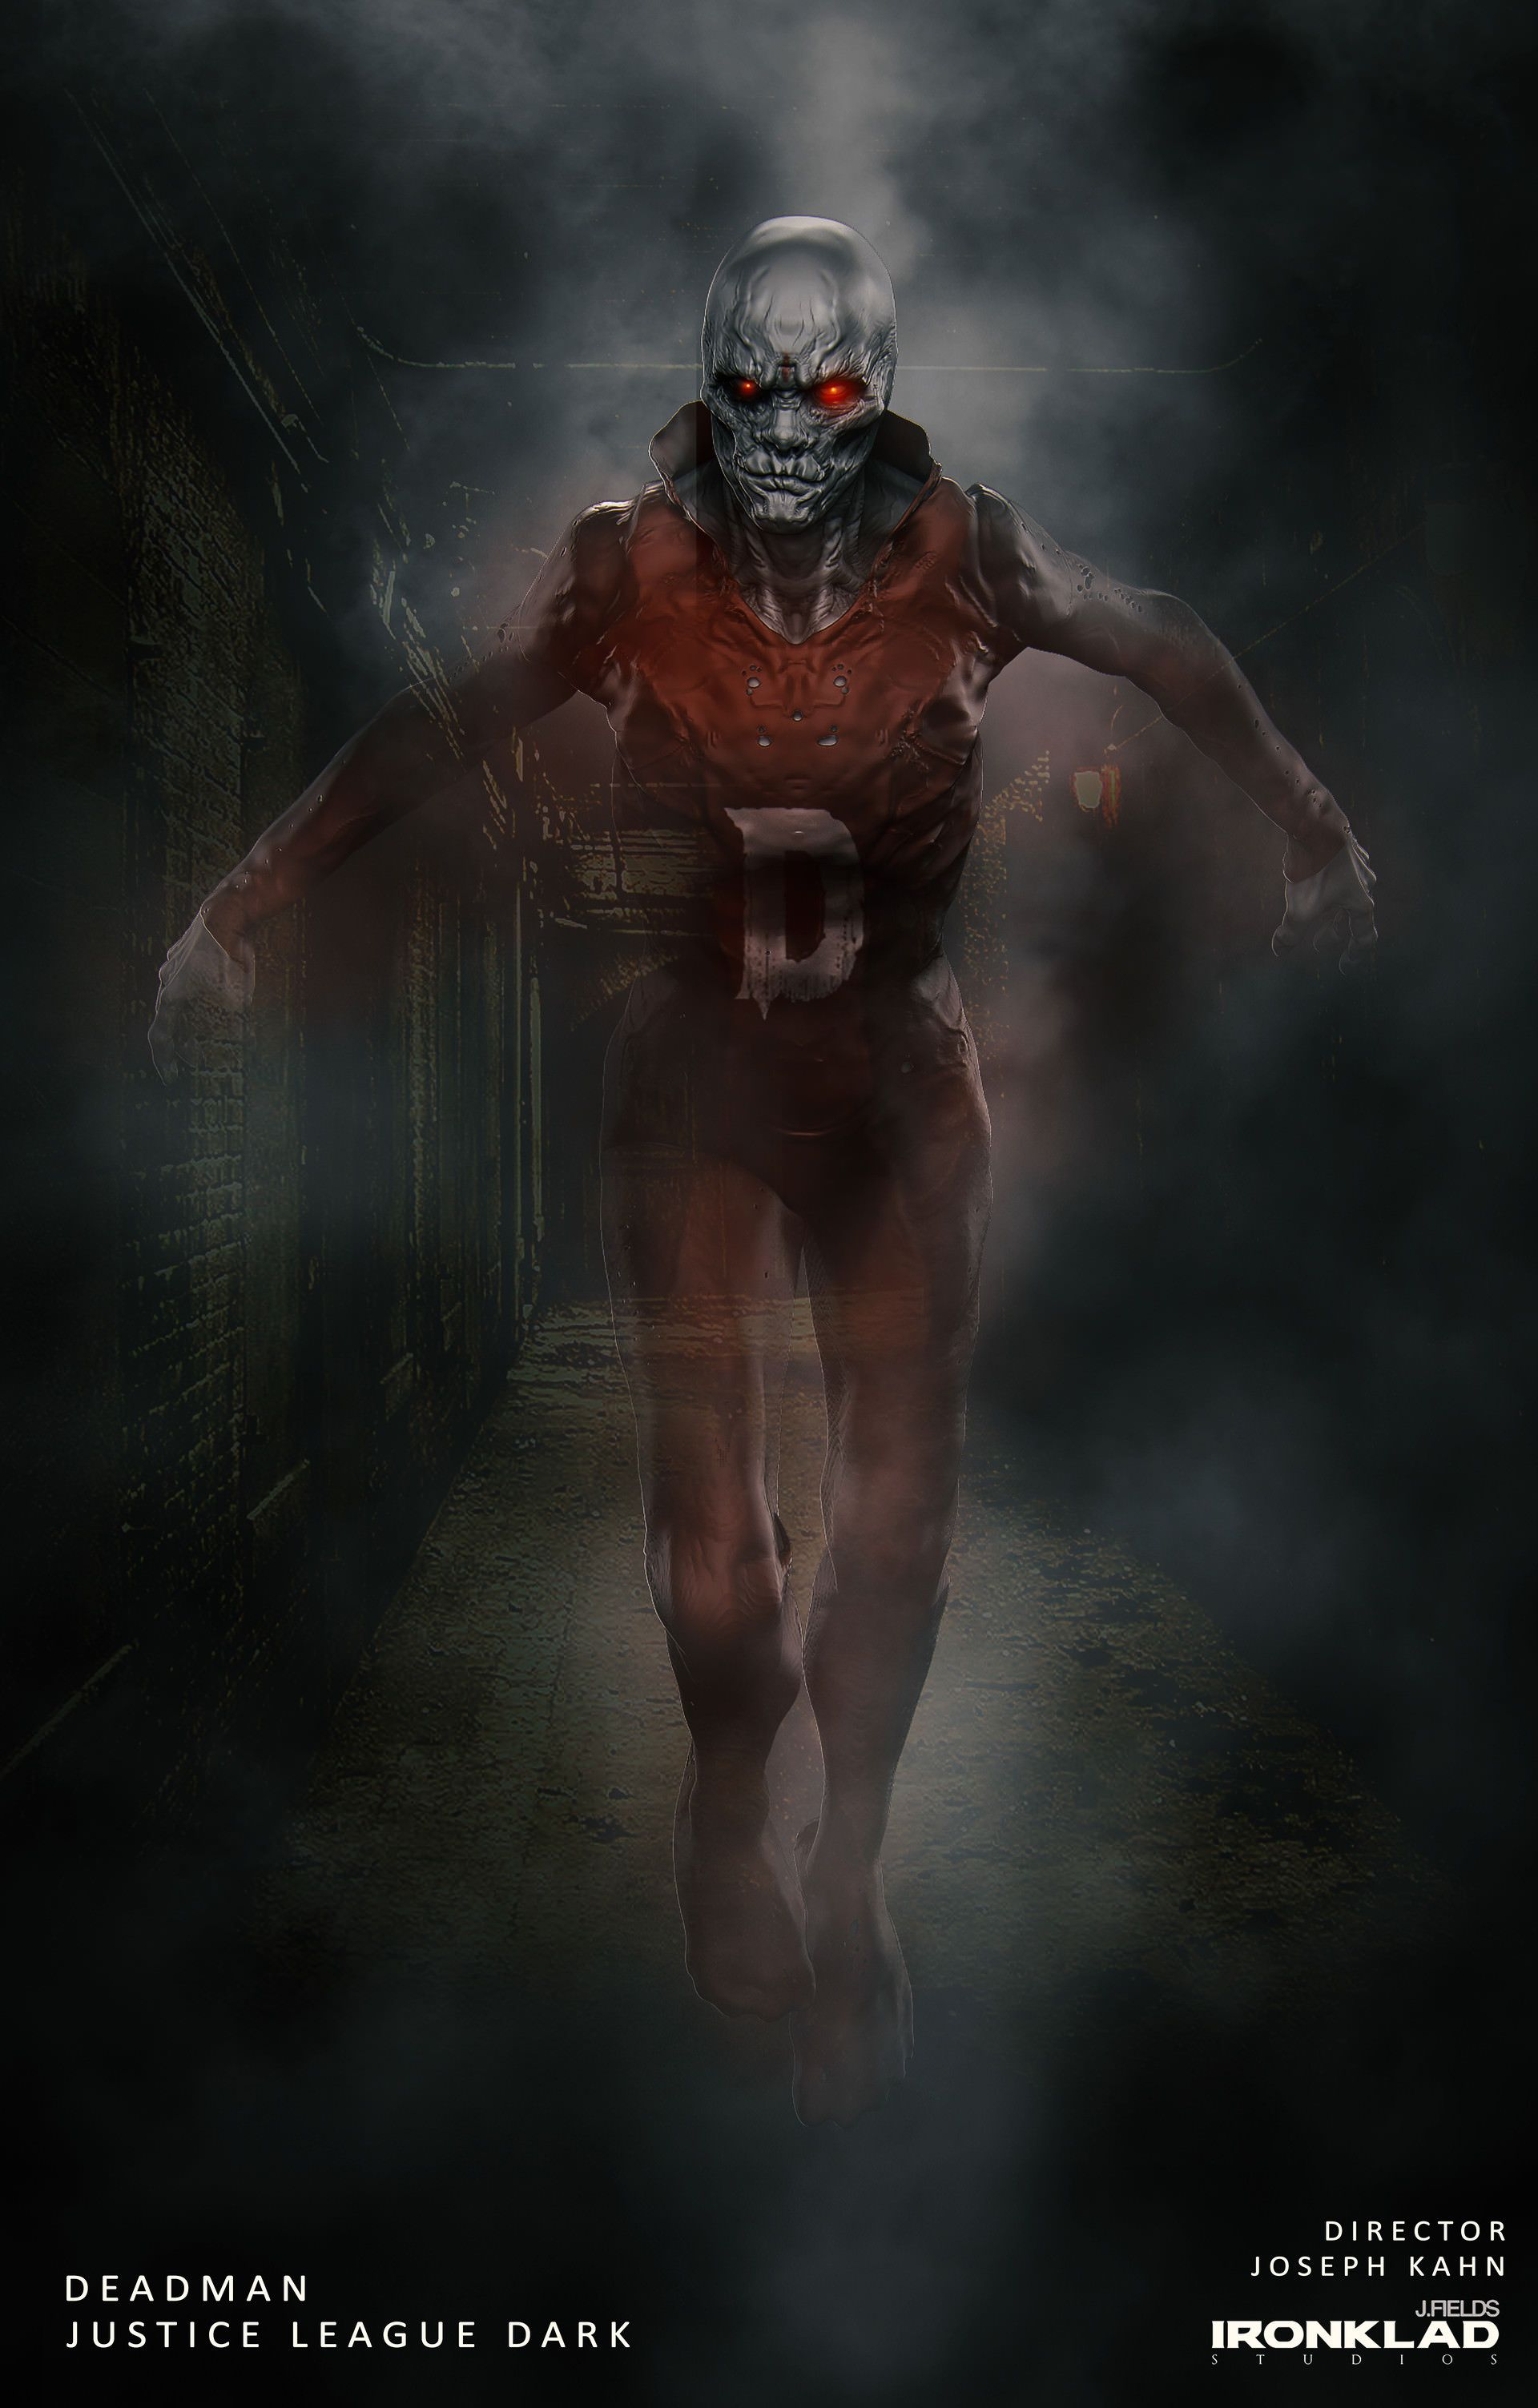 Deadman concept art | Justice league dark movie, Justice league dark, Justice league